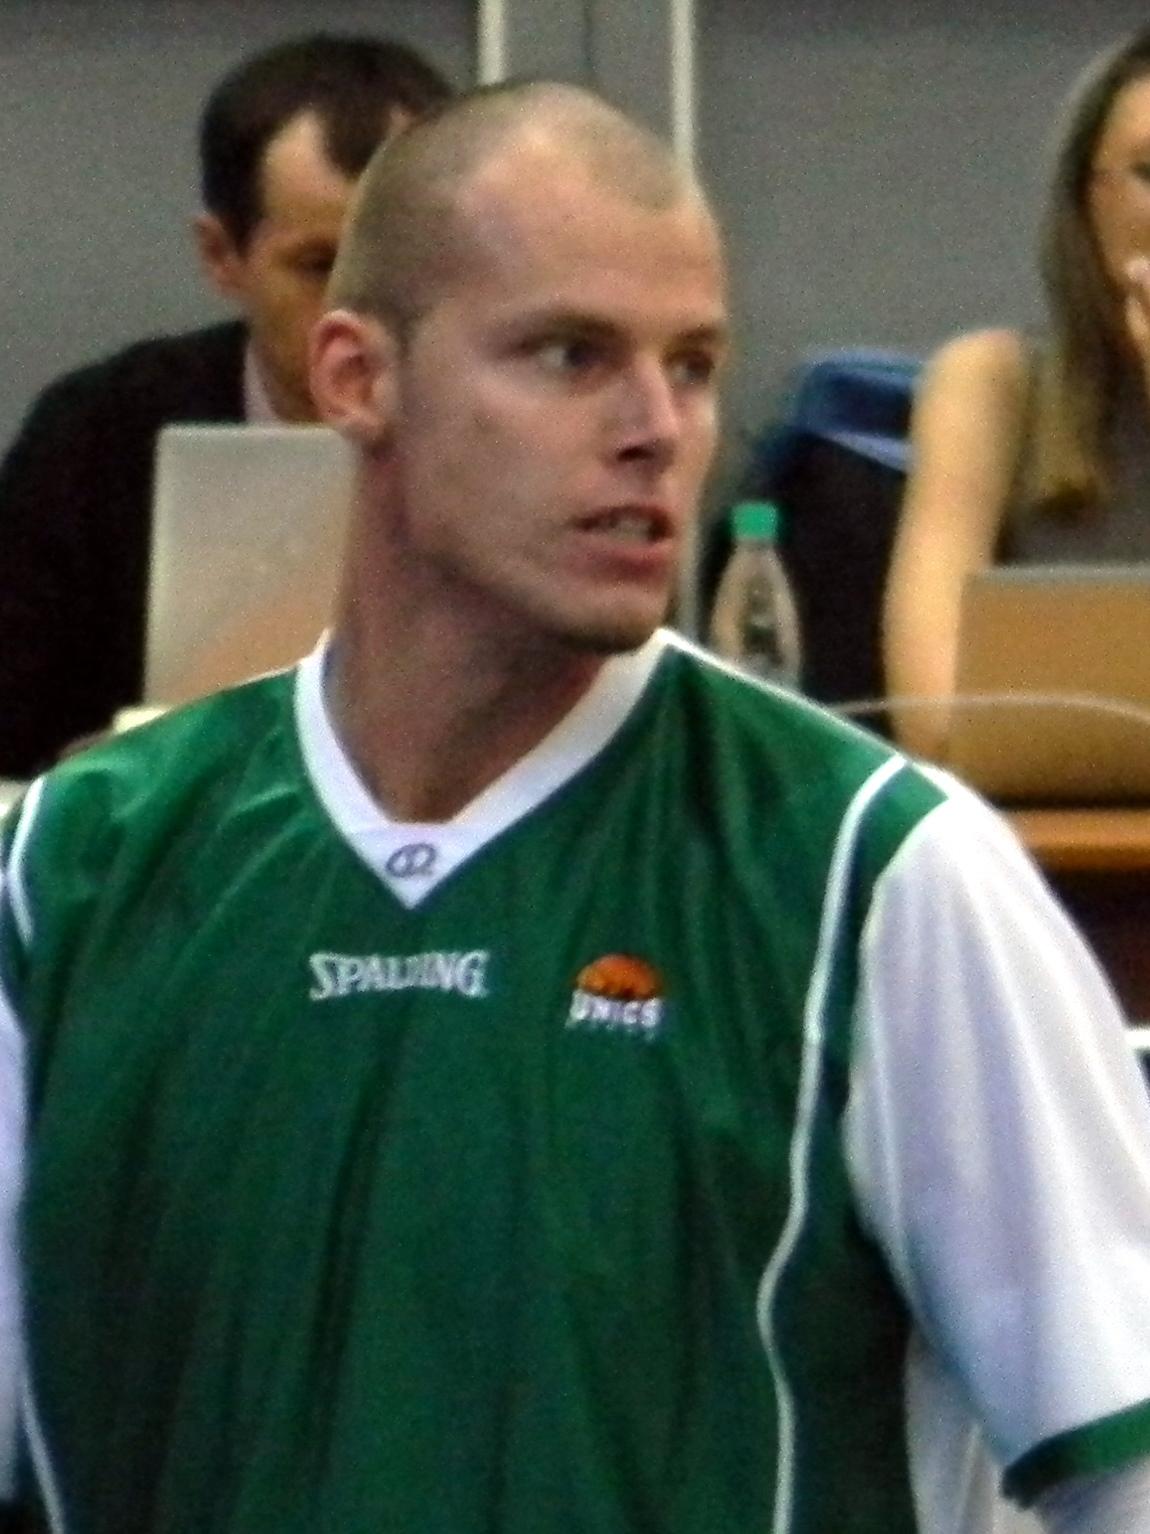 File:Maciej Lampe At All Star PBL Game 2011 (1).JPG